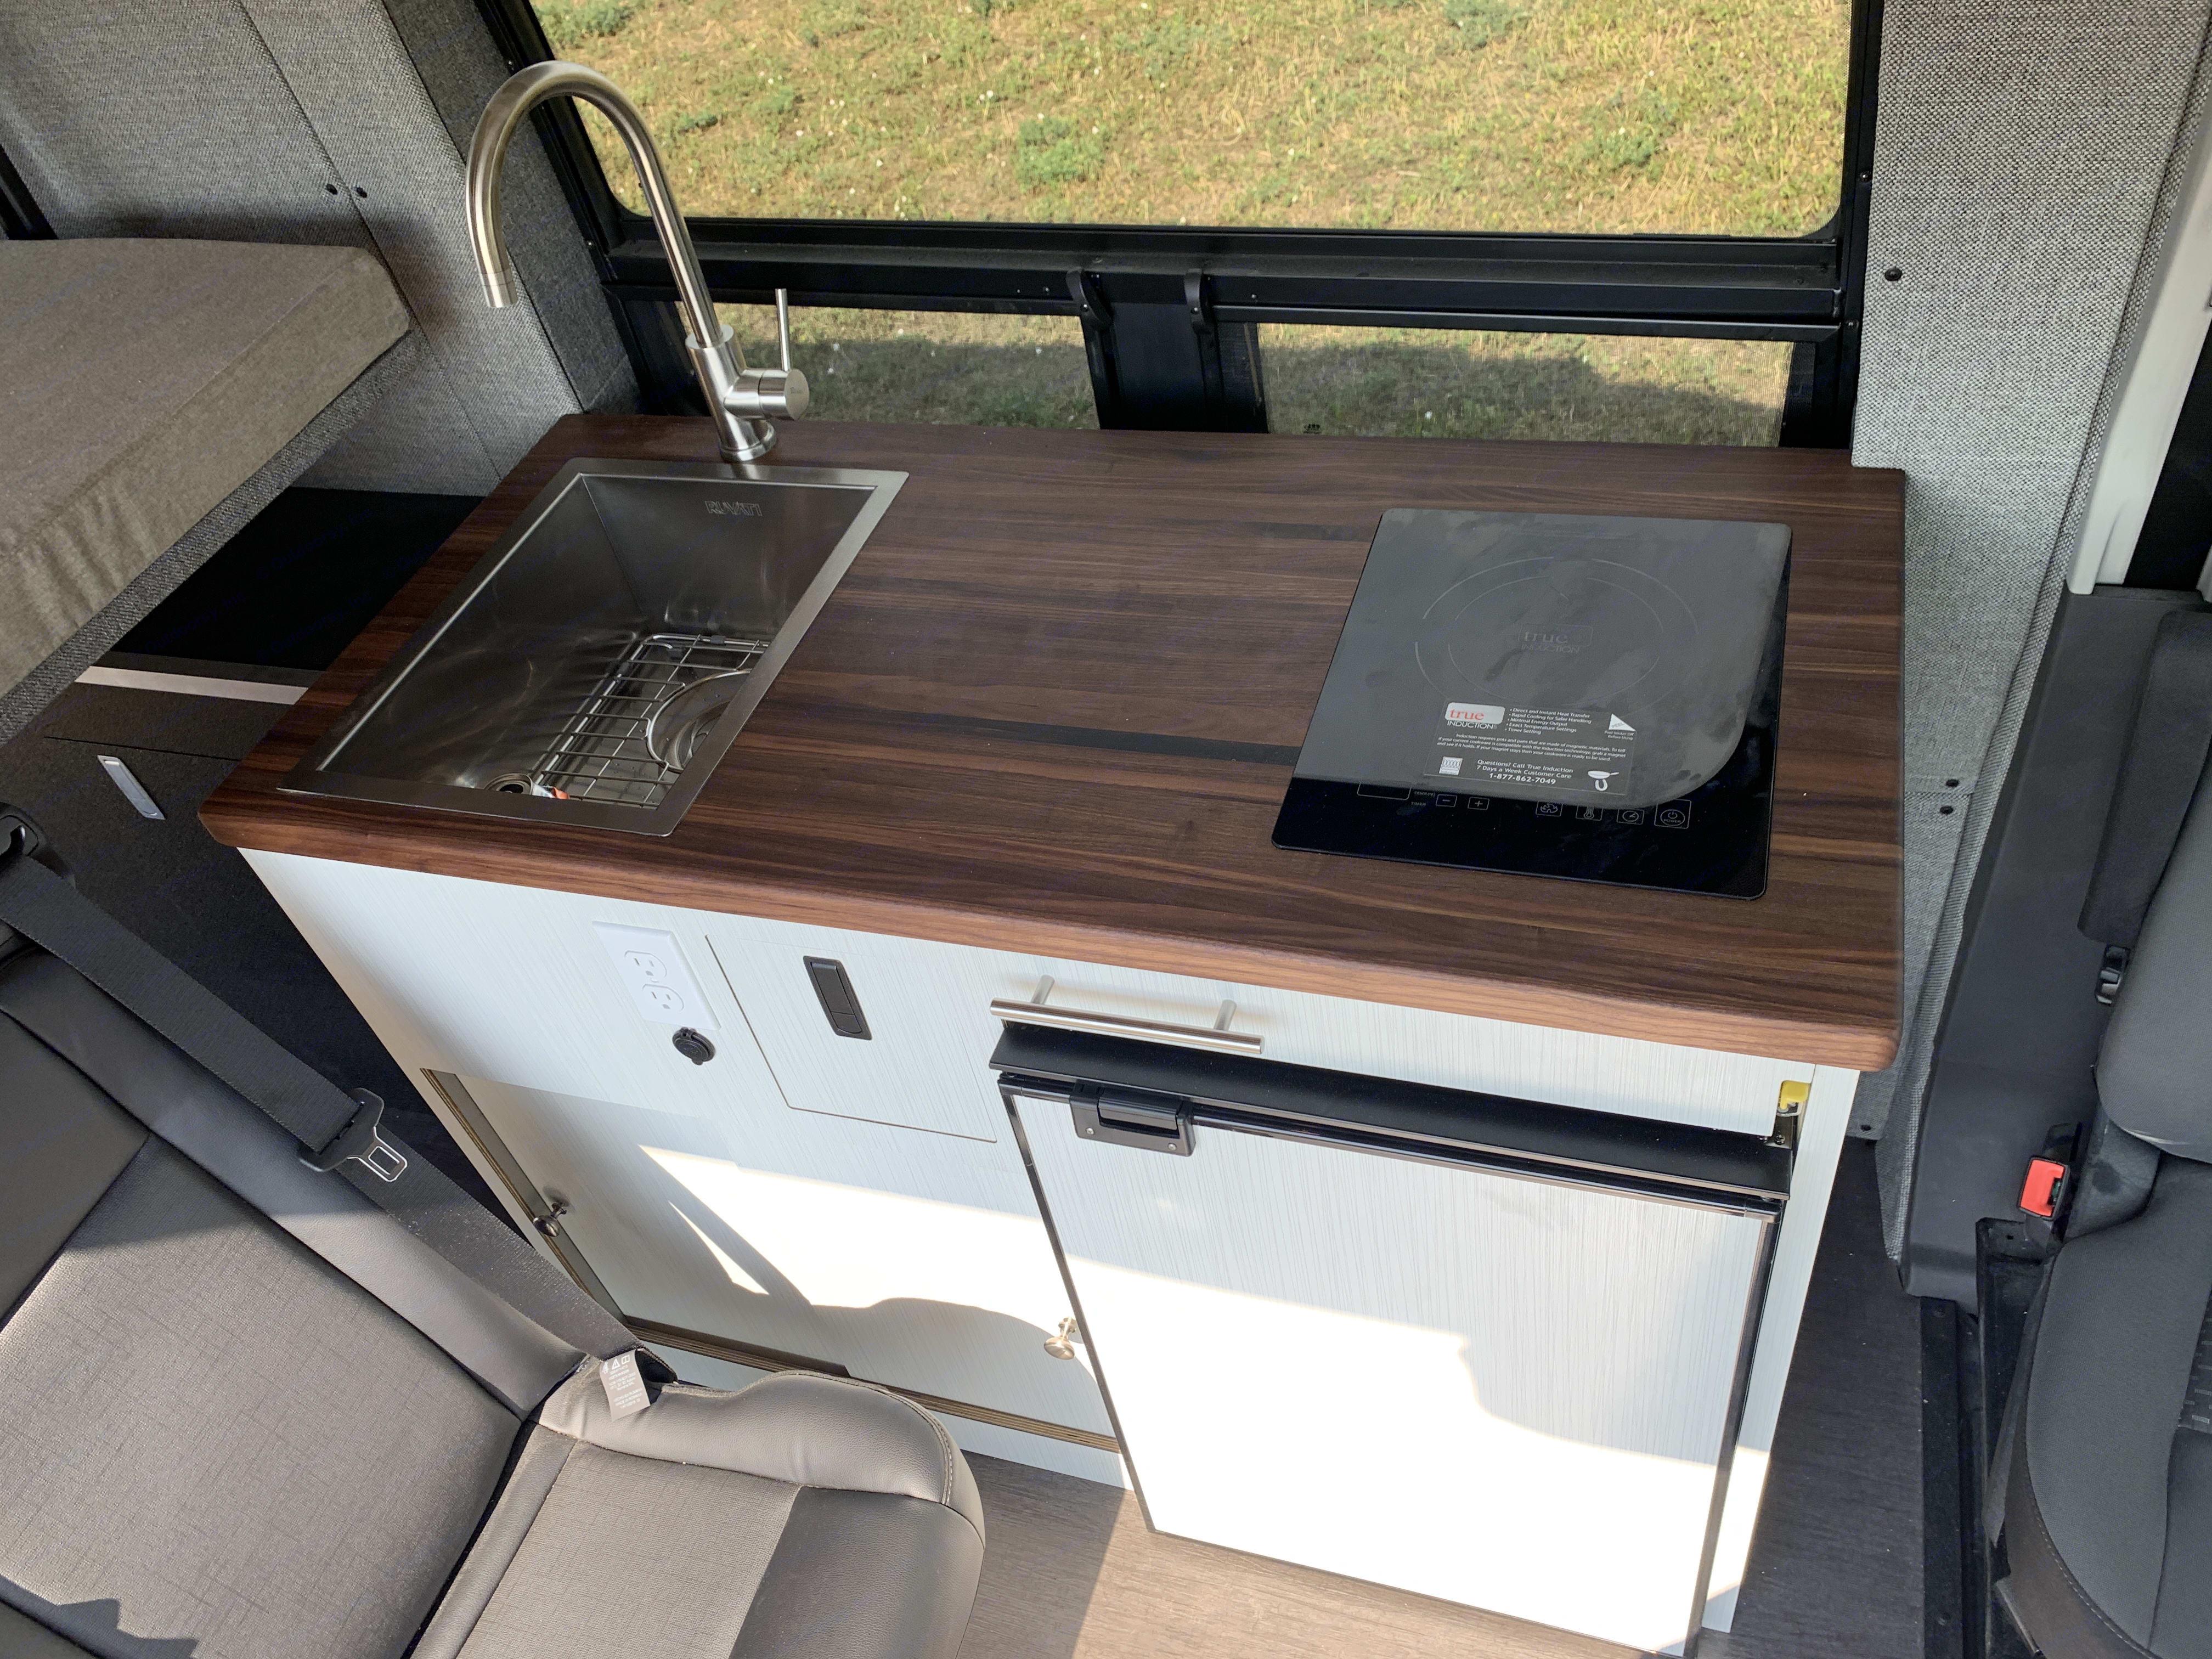 Full Kitchen. Ford Transit 2020